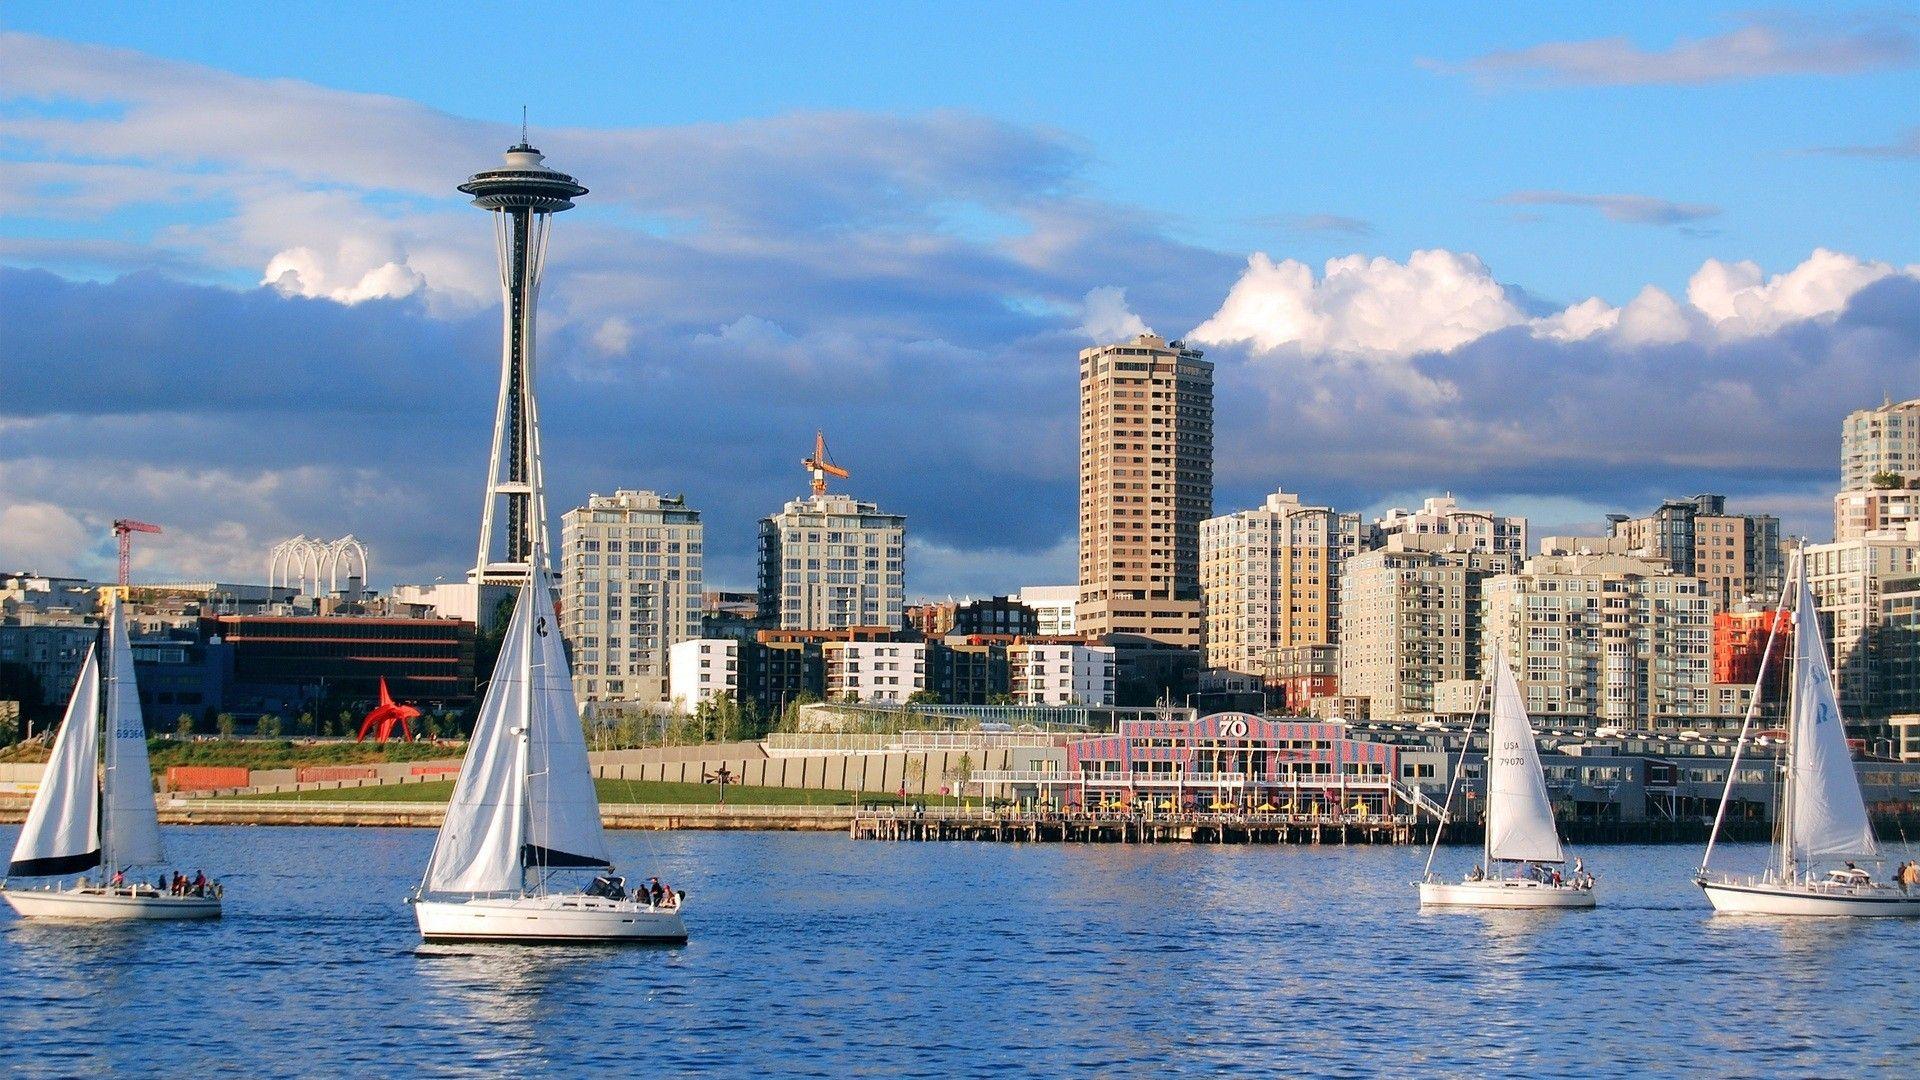 Seattle Space Needle Wallpaper Favimwalls Seattle Travel Seattle Wallpaper Seattle Travel Guide